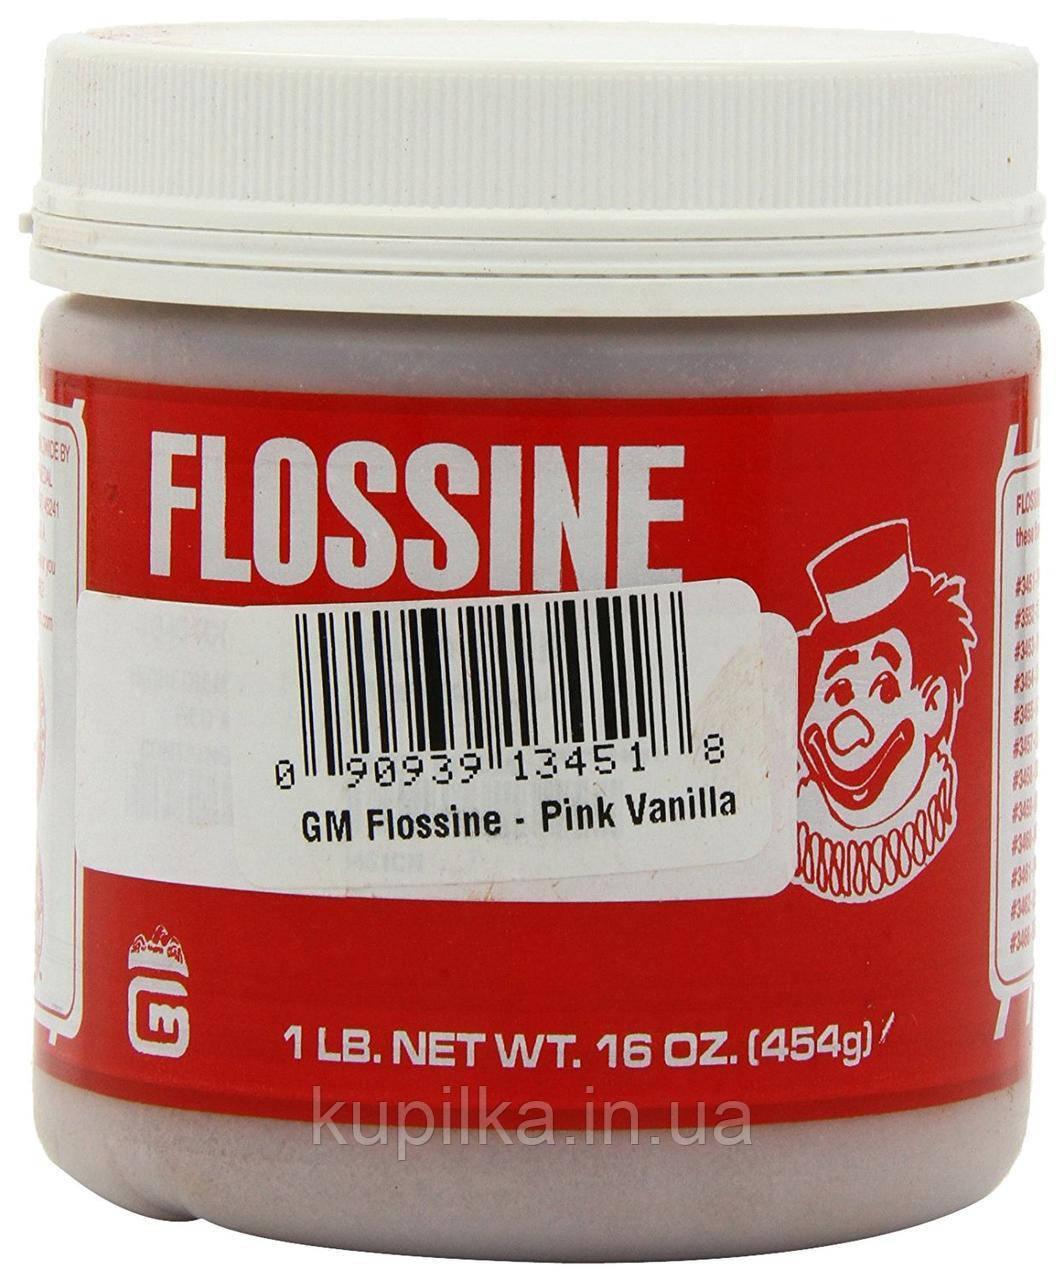 Вкусовая добавка для сахарной ваты апельсин Flossine, Gold Medal (США)